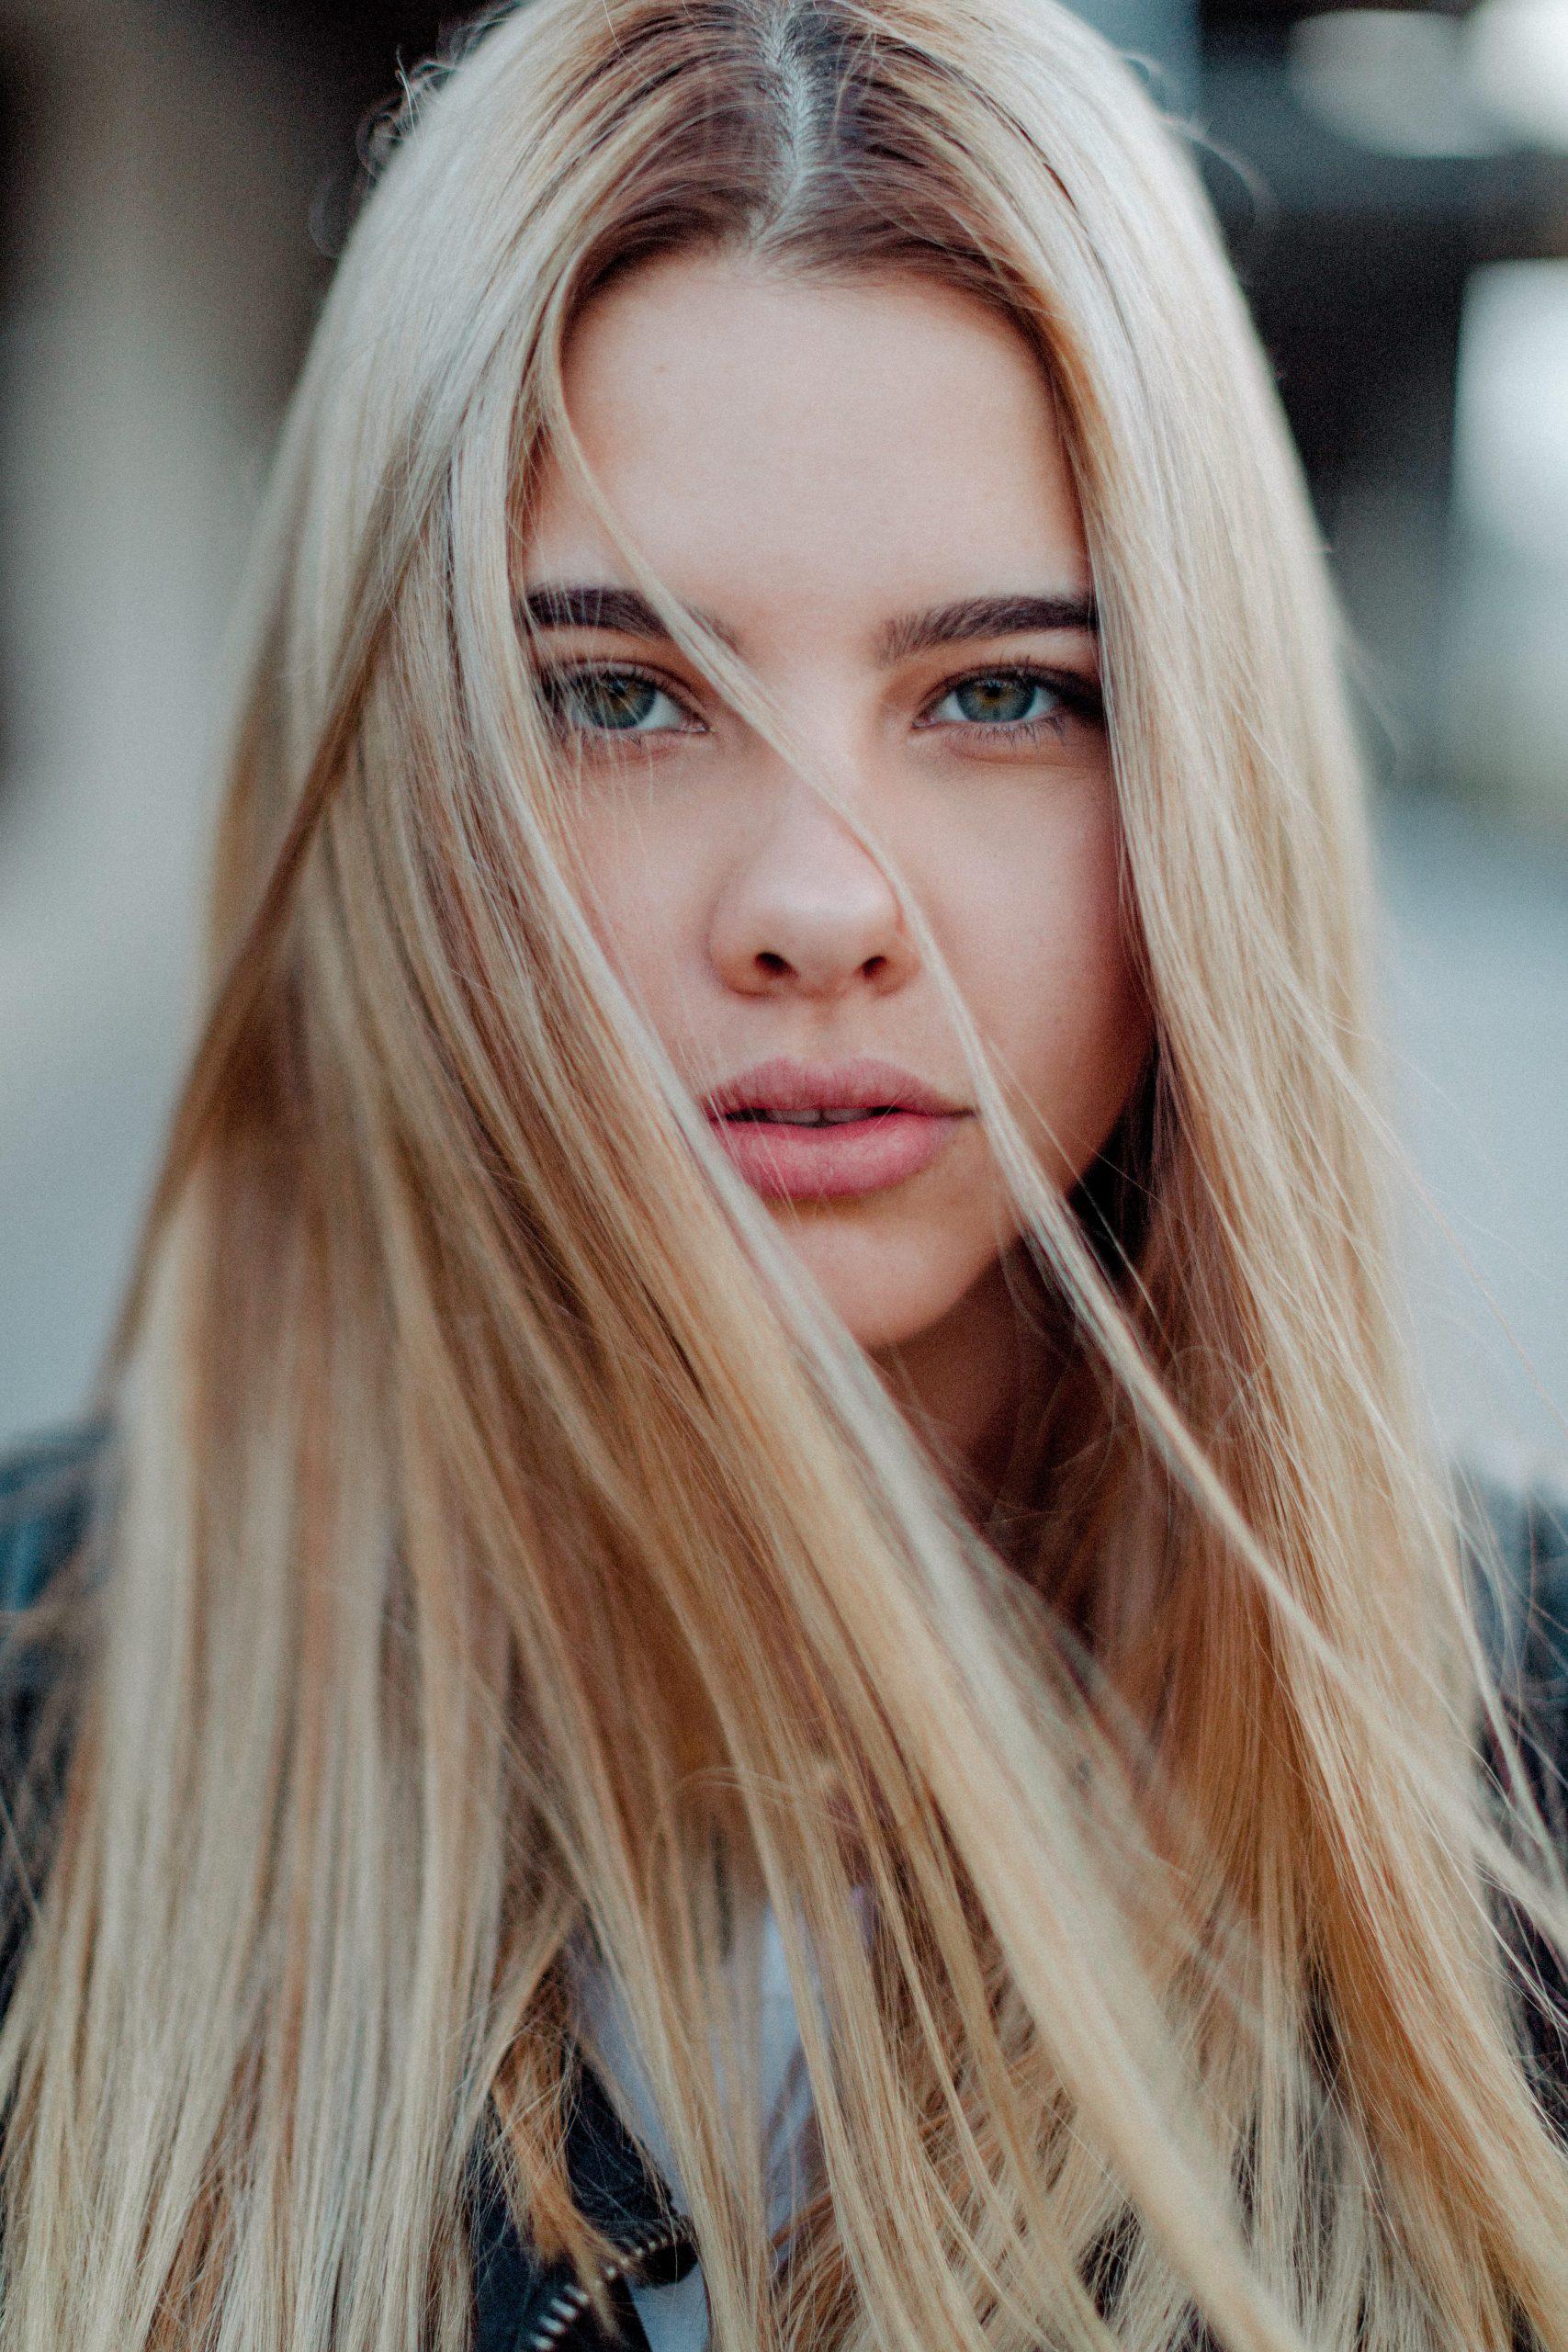 7-portrait-blogger-after